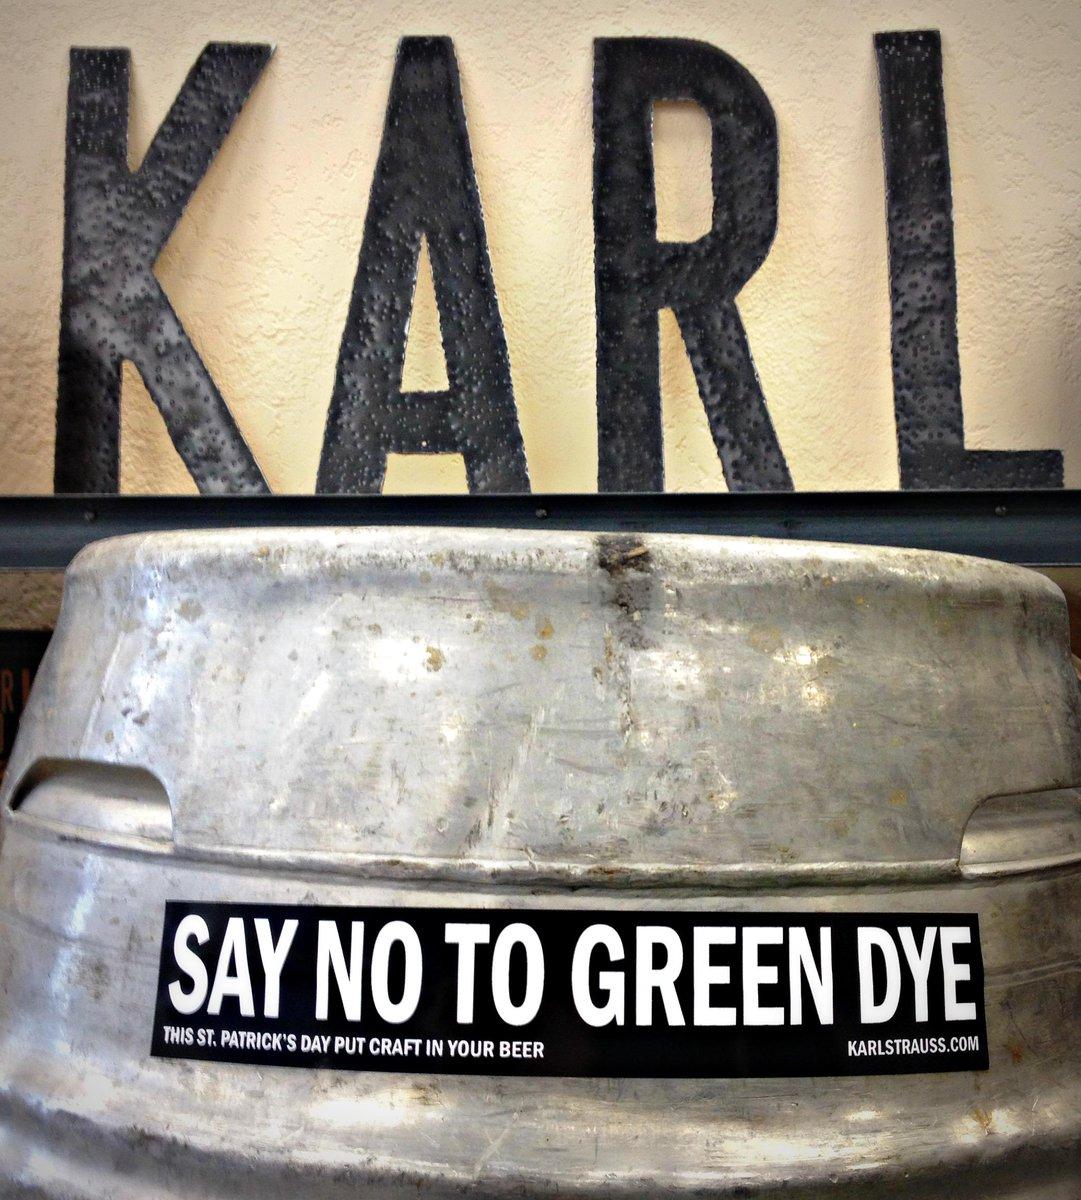 Friends don't let friends drink green beer. #JustSayNo http://t.co/F76bjMpybT